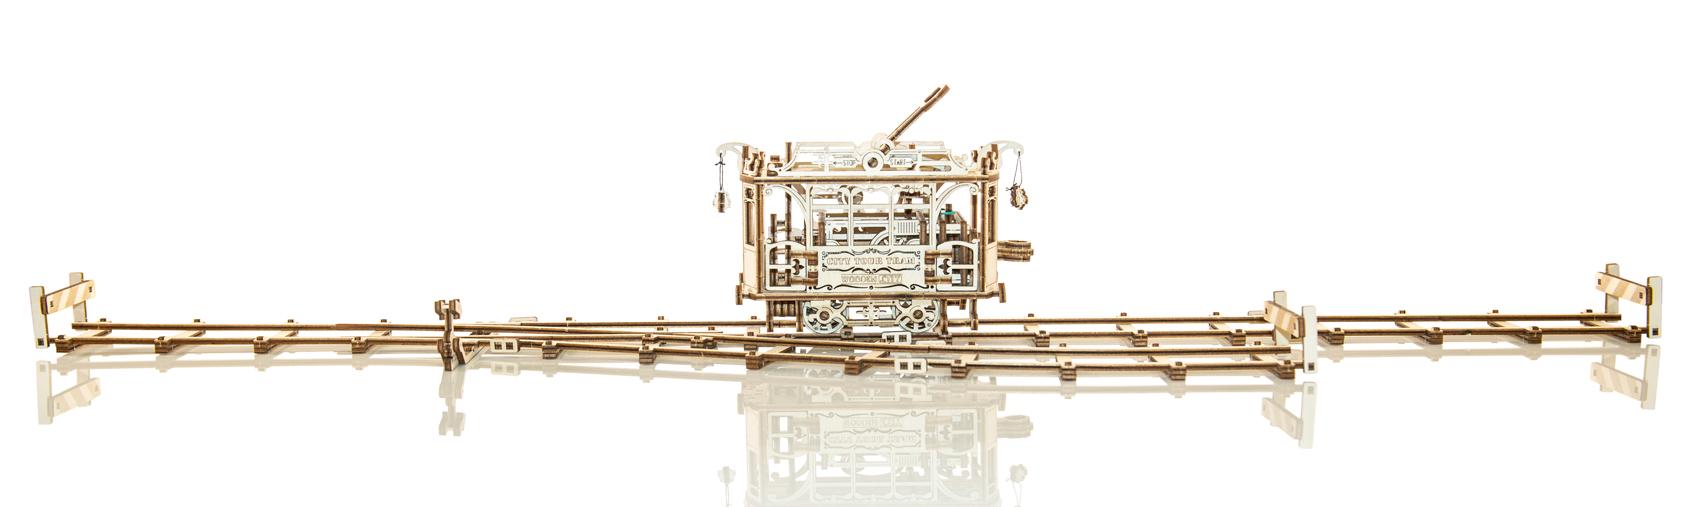 City Tram + Rails Trains Wooden Jigsaw Puzzle